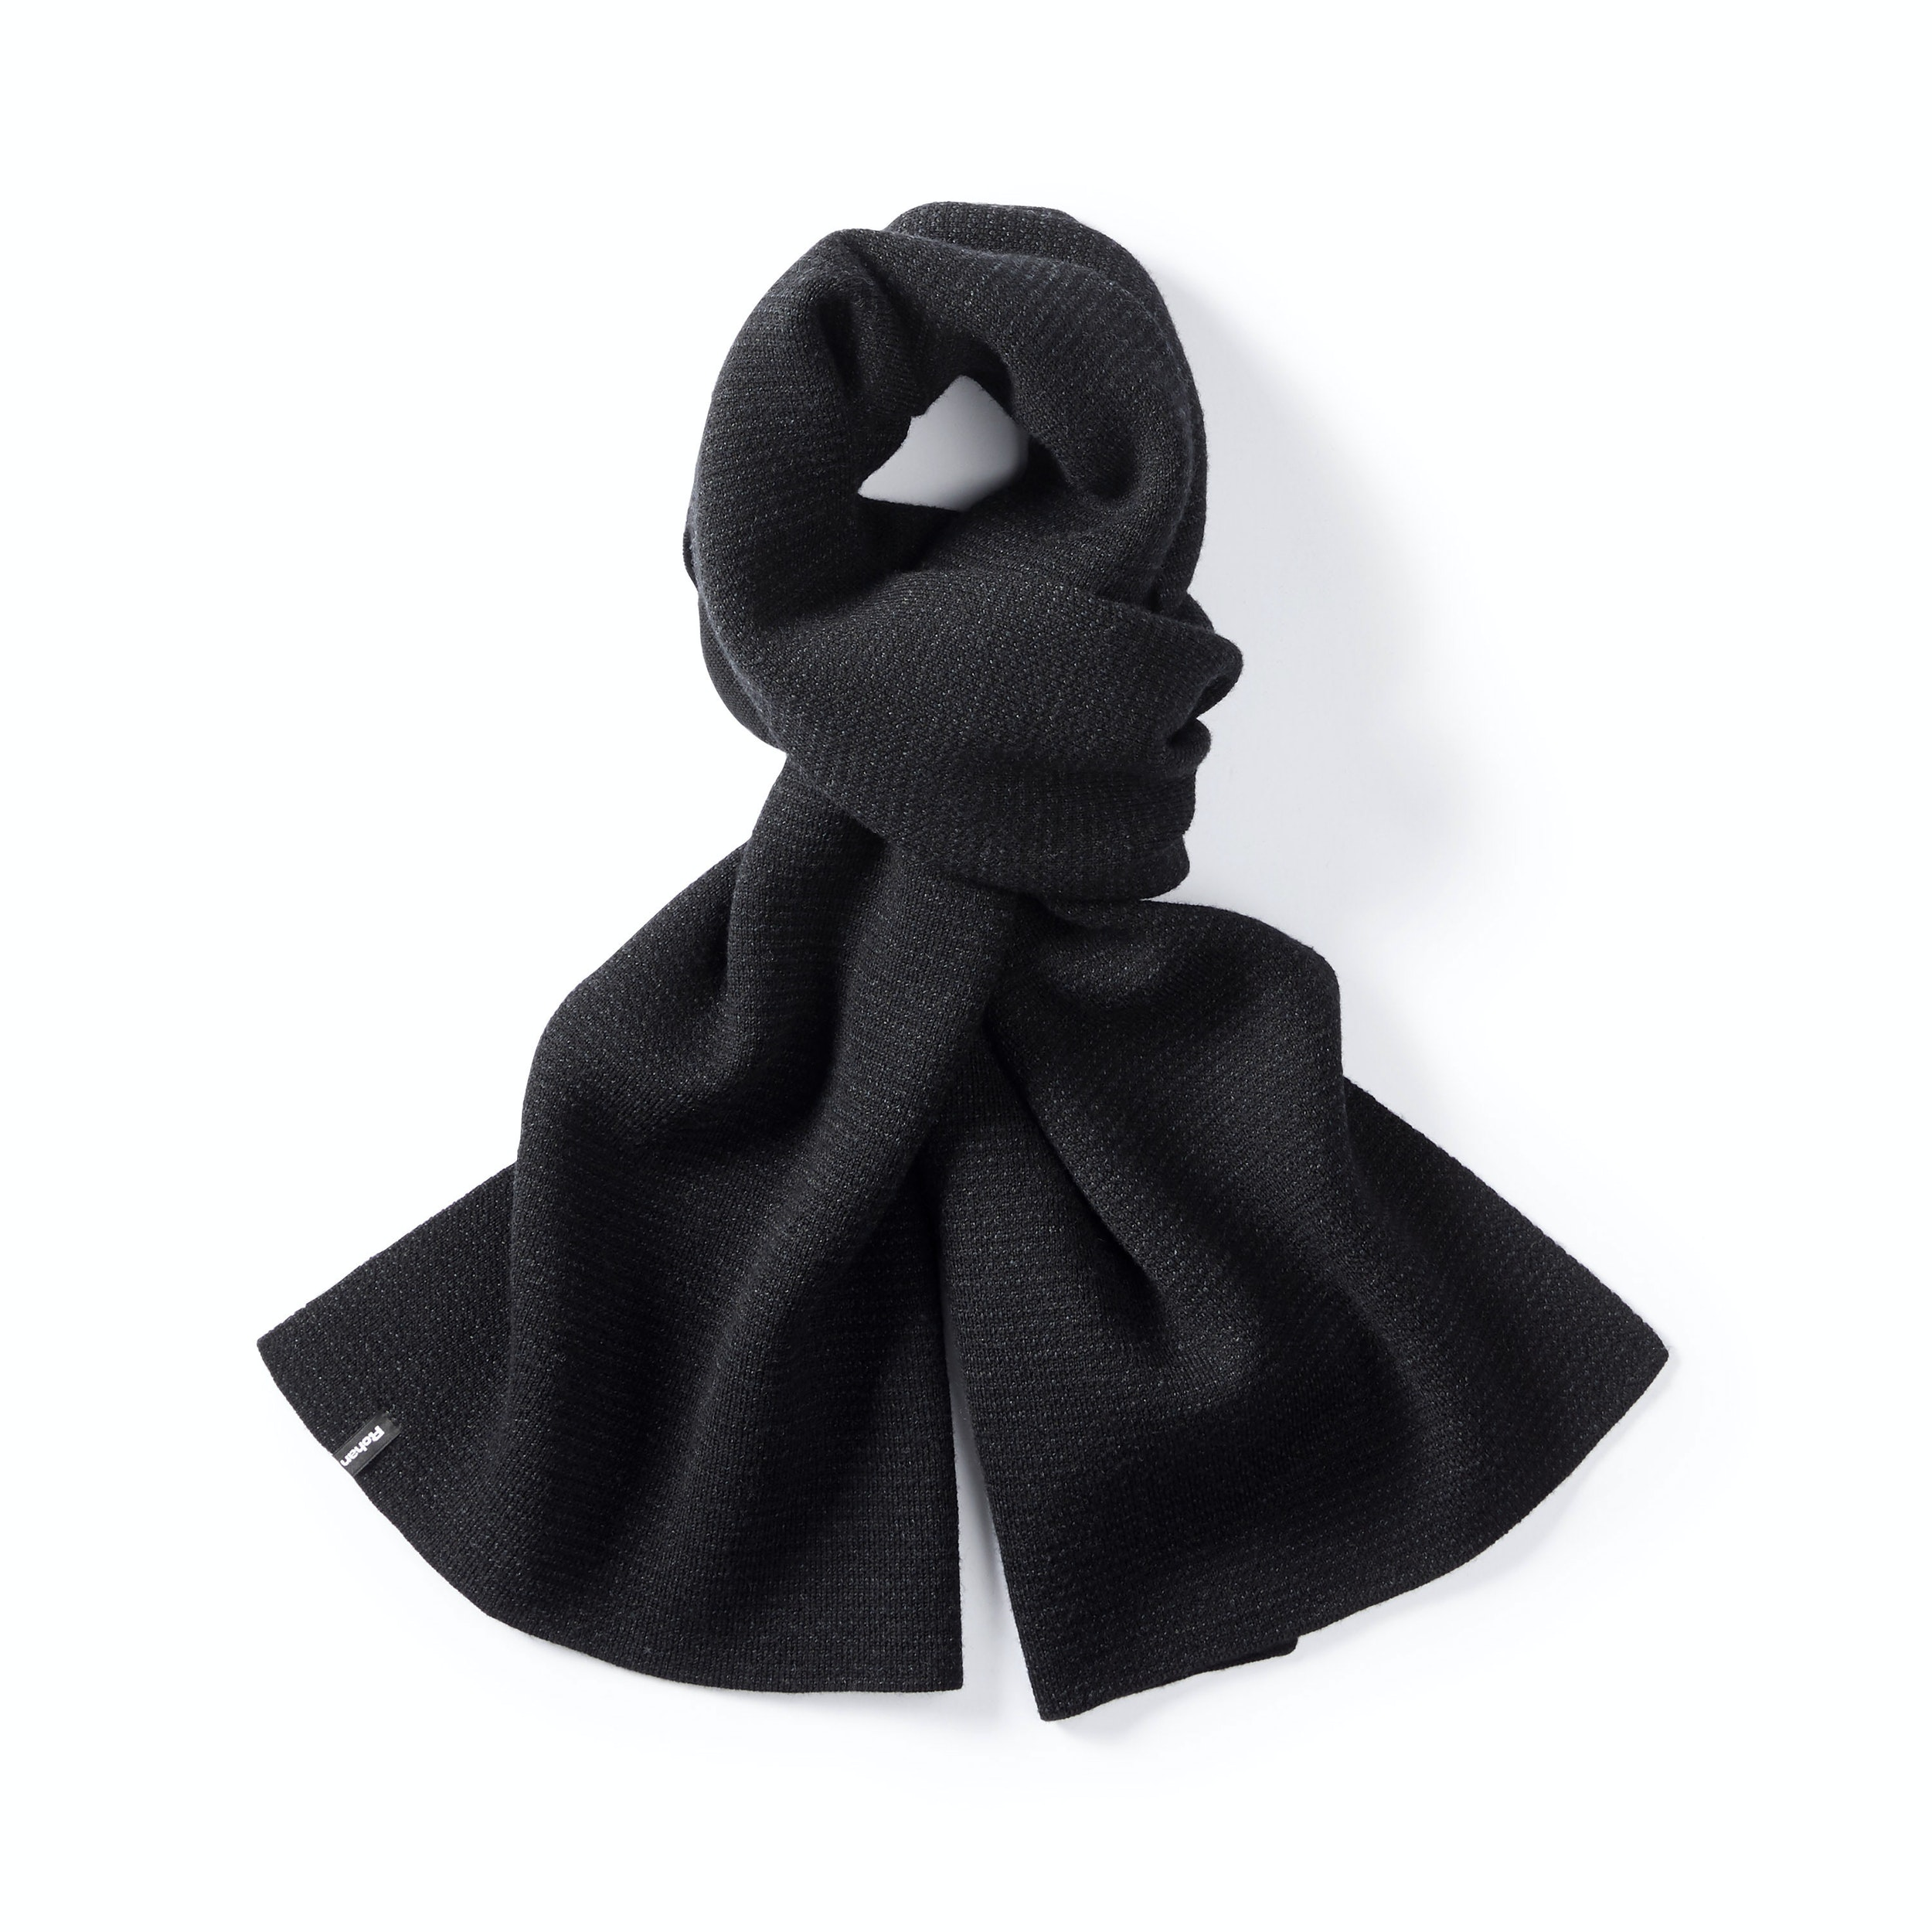 c230b09c439 Extrafine Merino Scarf - Reversible 100% extrafine merino scarf.